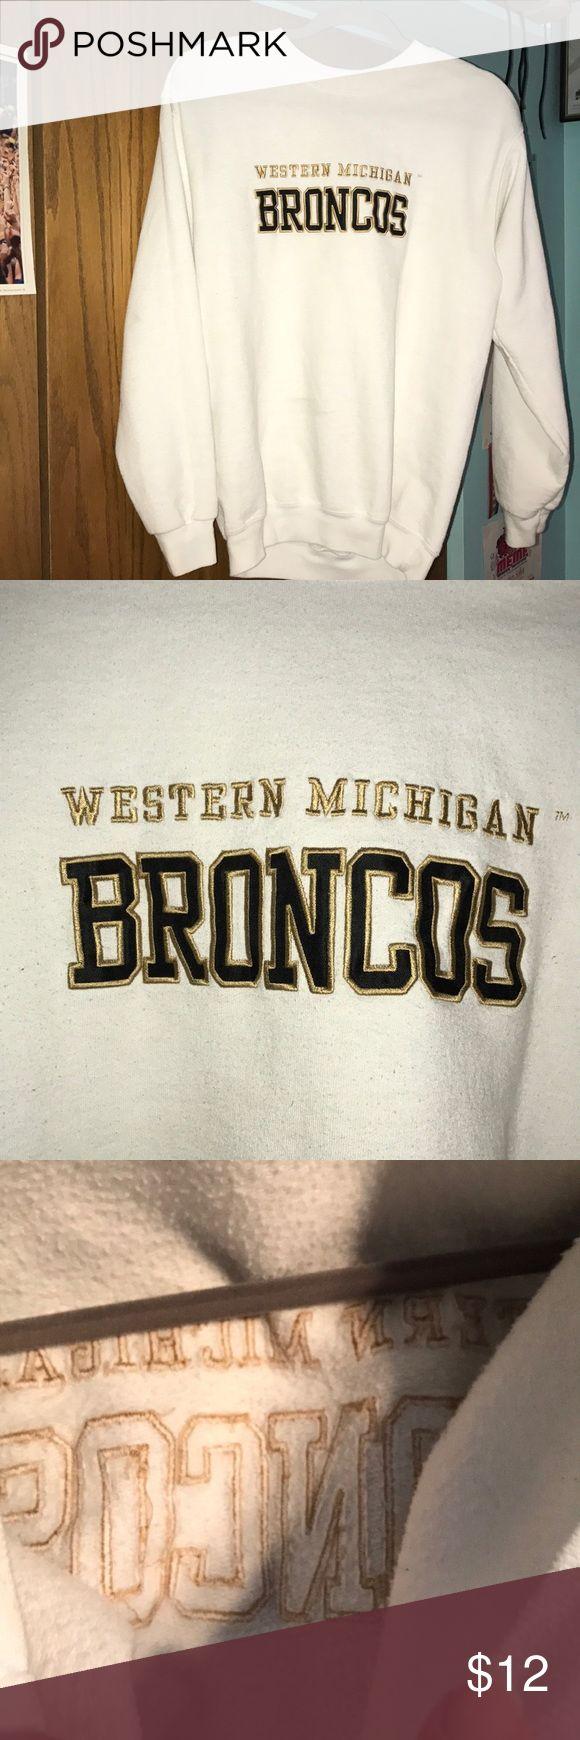 Western Michigan University Crewneck Adult small Western Michigan University crewneck. I'm great condition, clean white color. Tops Sweatshirts & Hoodies